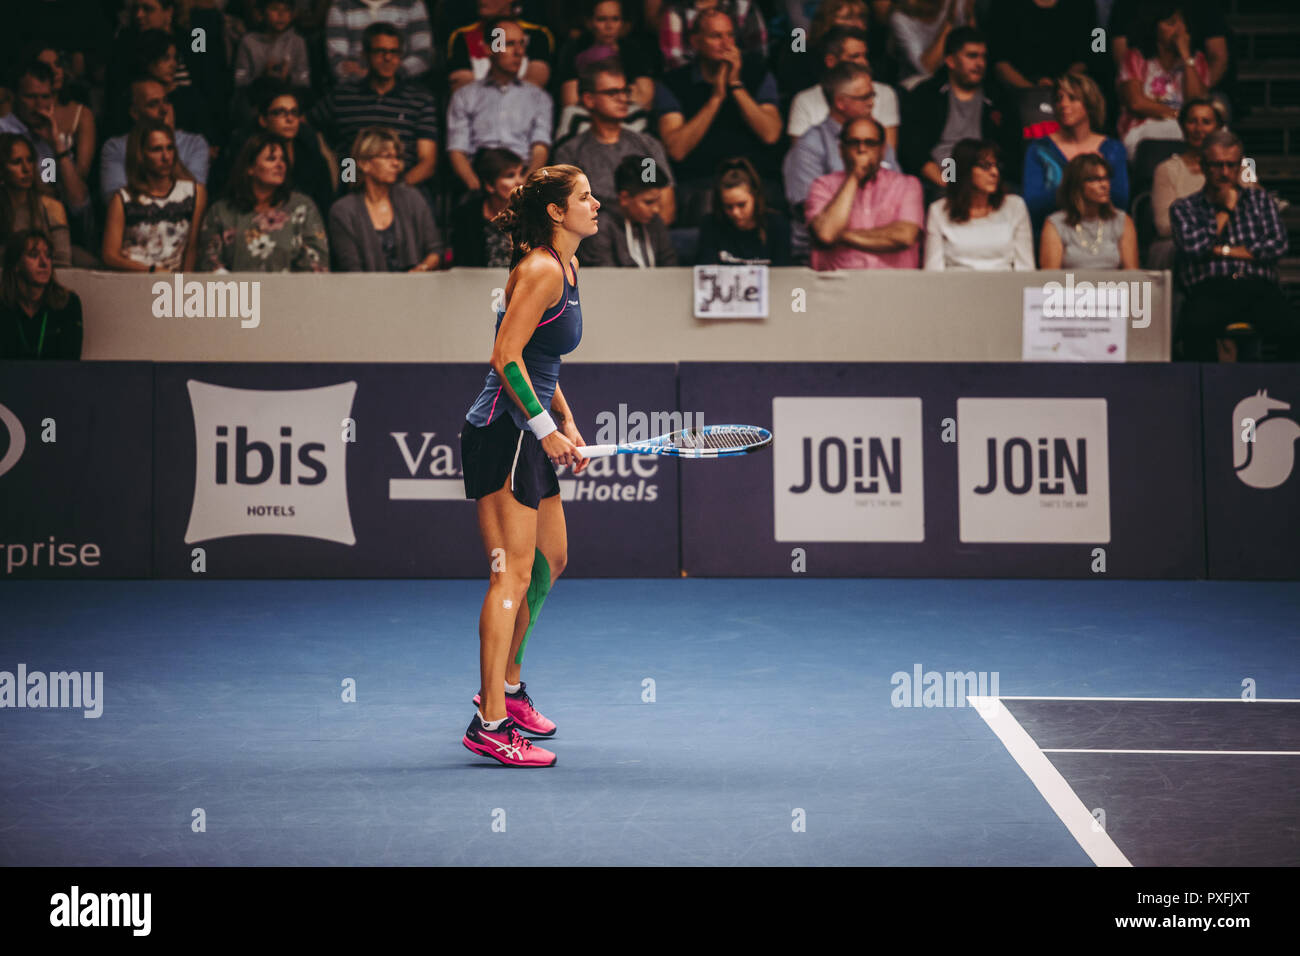 Belinda Bencic Stock Photos & Belinda Bencic Stock Images